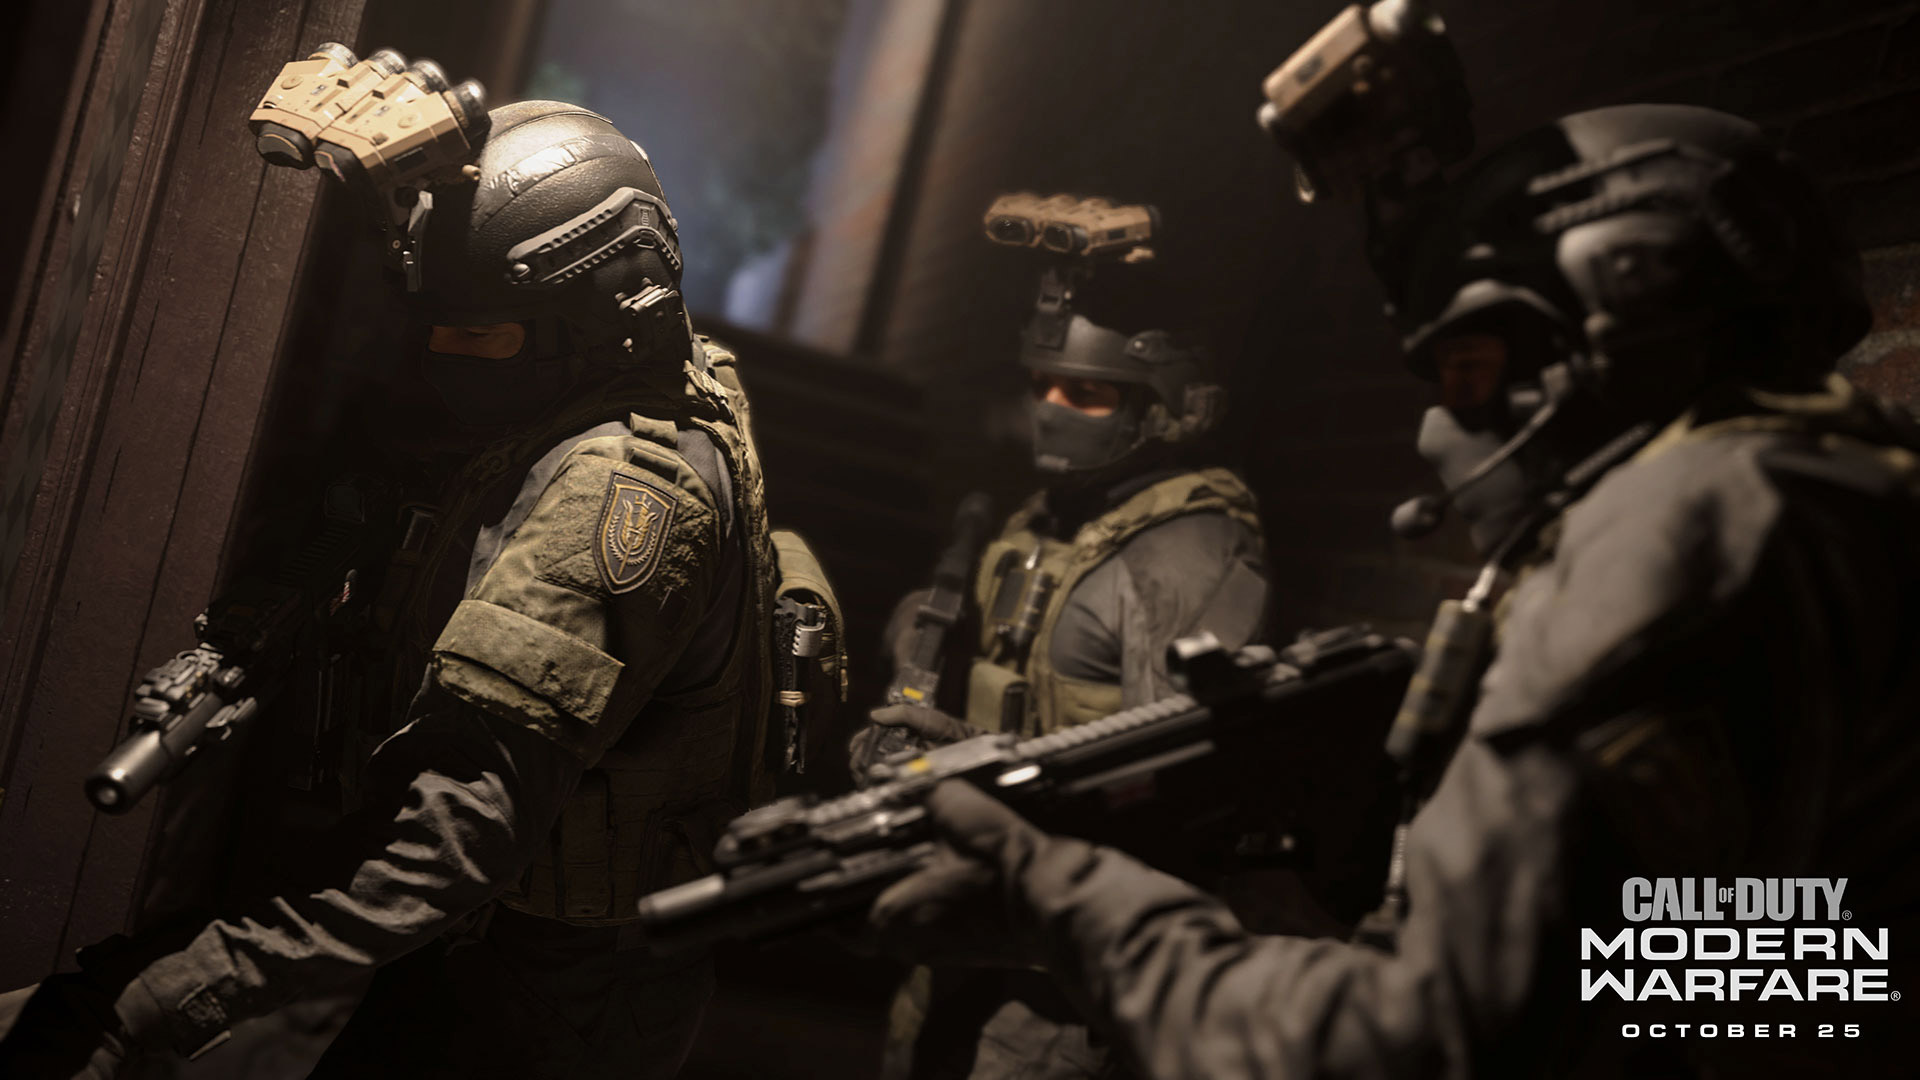 Will reloading make Modern Warfare more authentic?